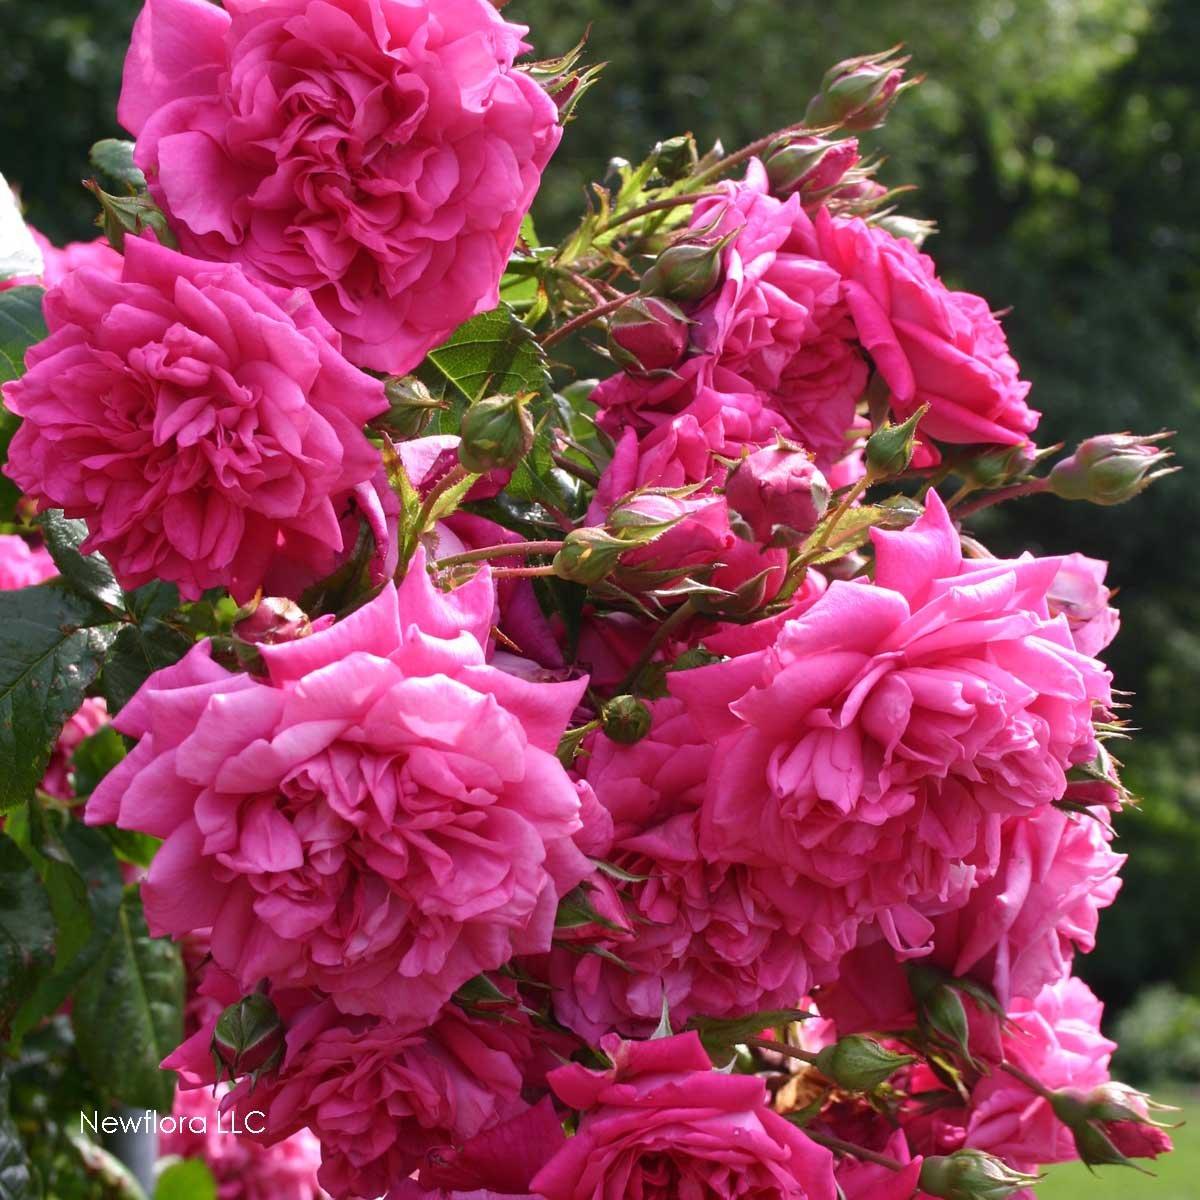 Laguna rose bush fragrant pink climbing rose organic grown large laguna rose bush fragrant pink climbing rose organic grown large pink flowers 4 potted flowers patio lawn garden tibs mightylinksfo